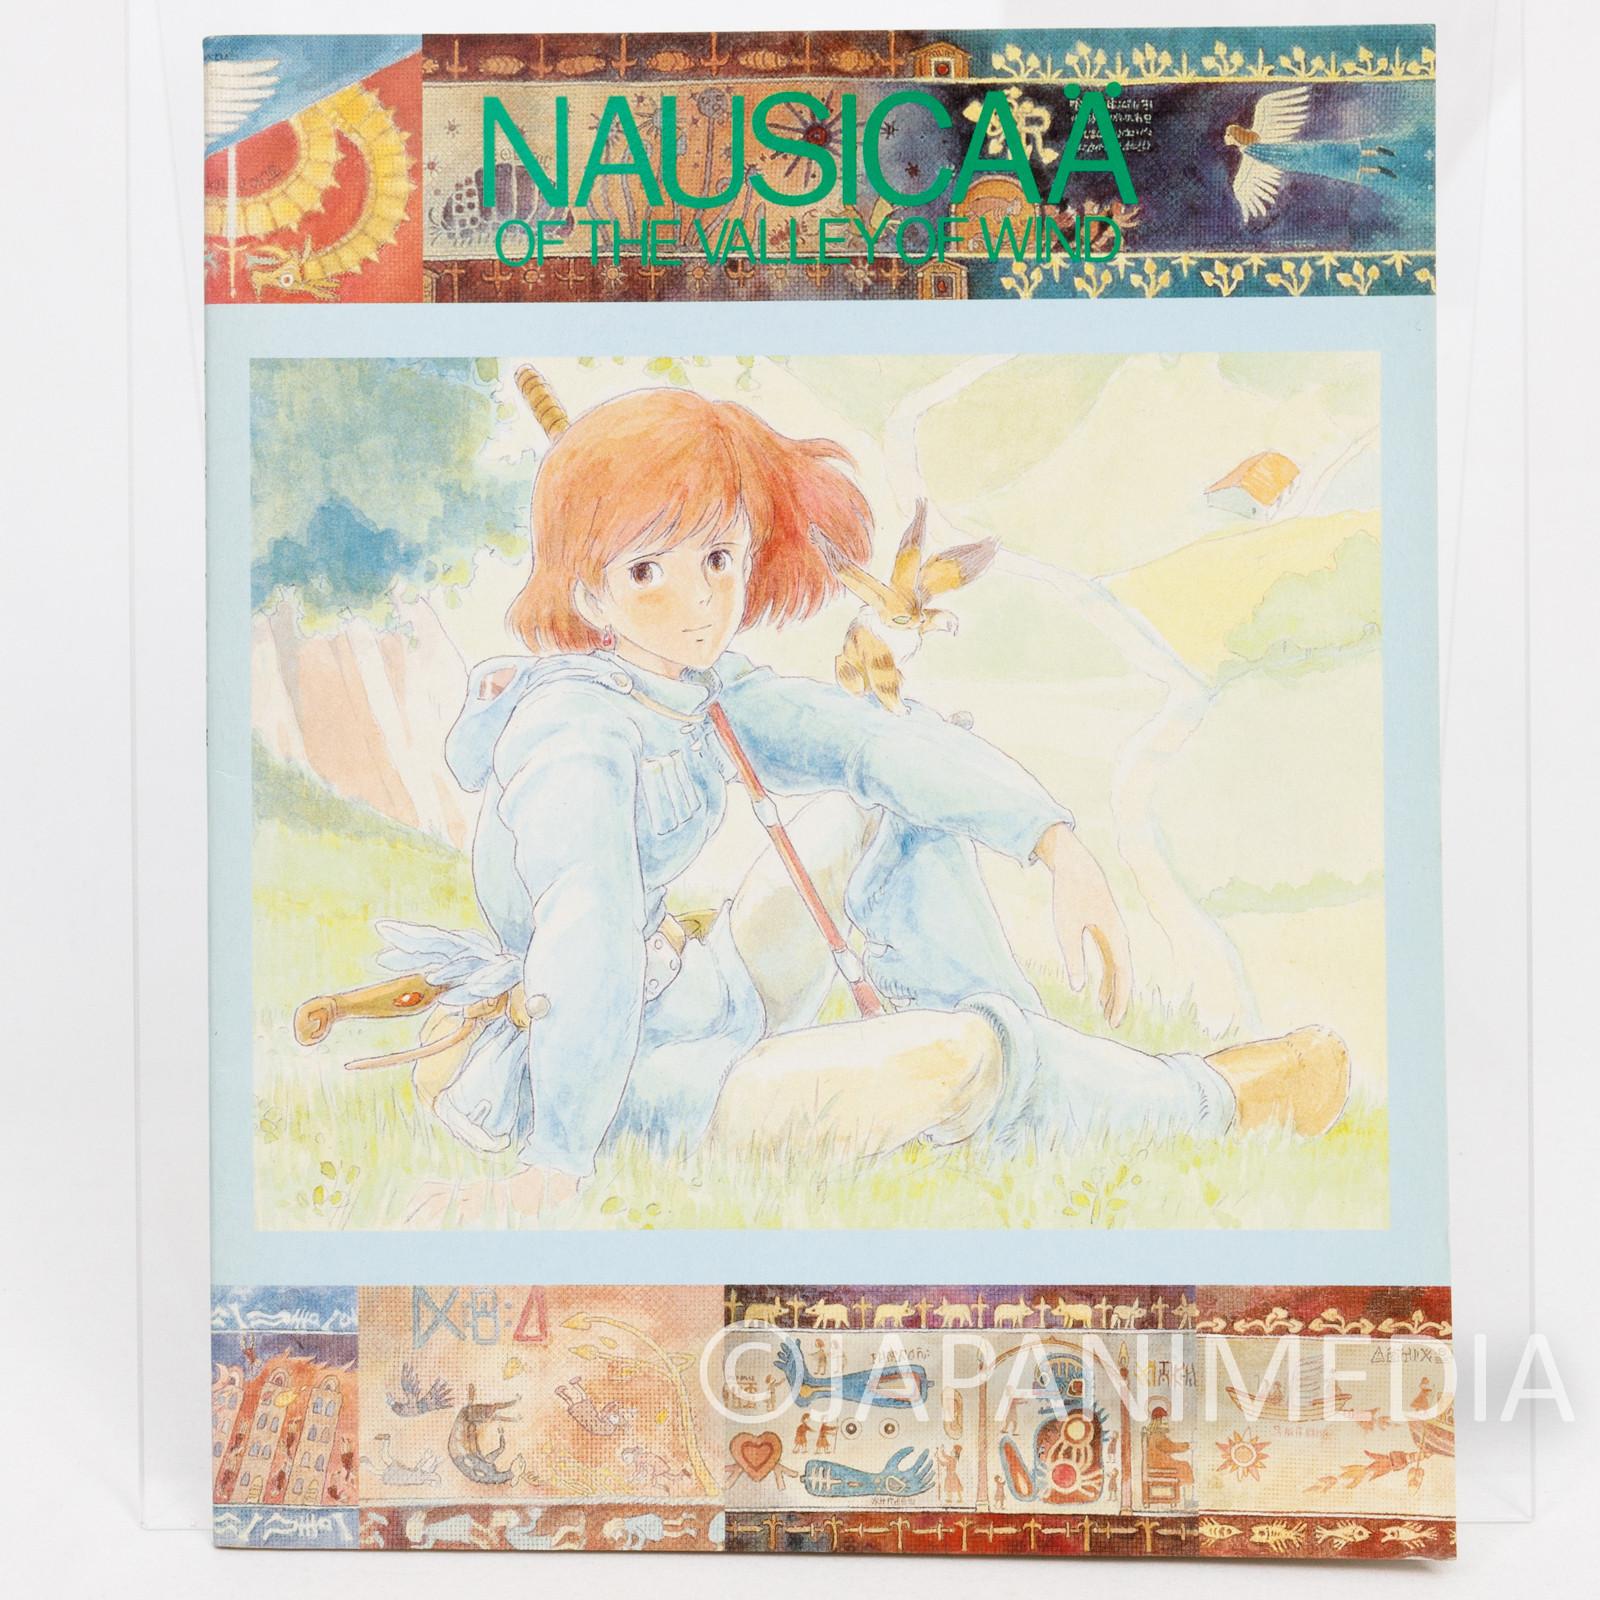 Retro RARE Nausicaa of the Valley Notebook #4 Ghibli JAPAN ANIME MANGA